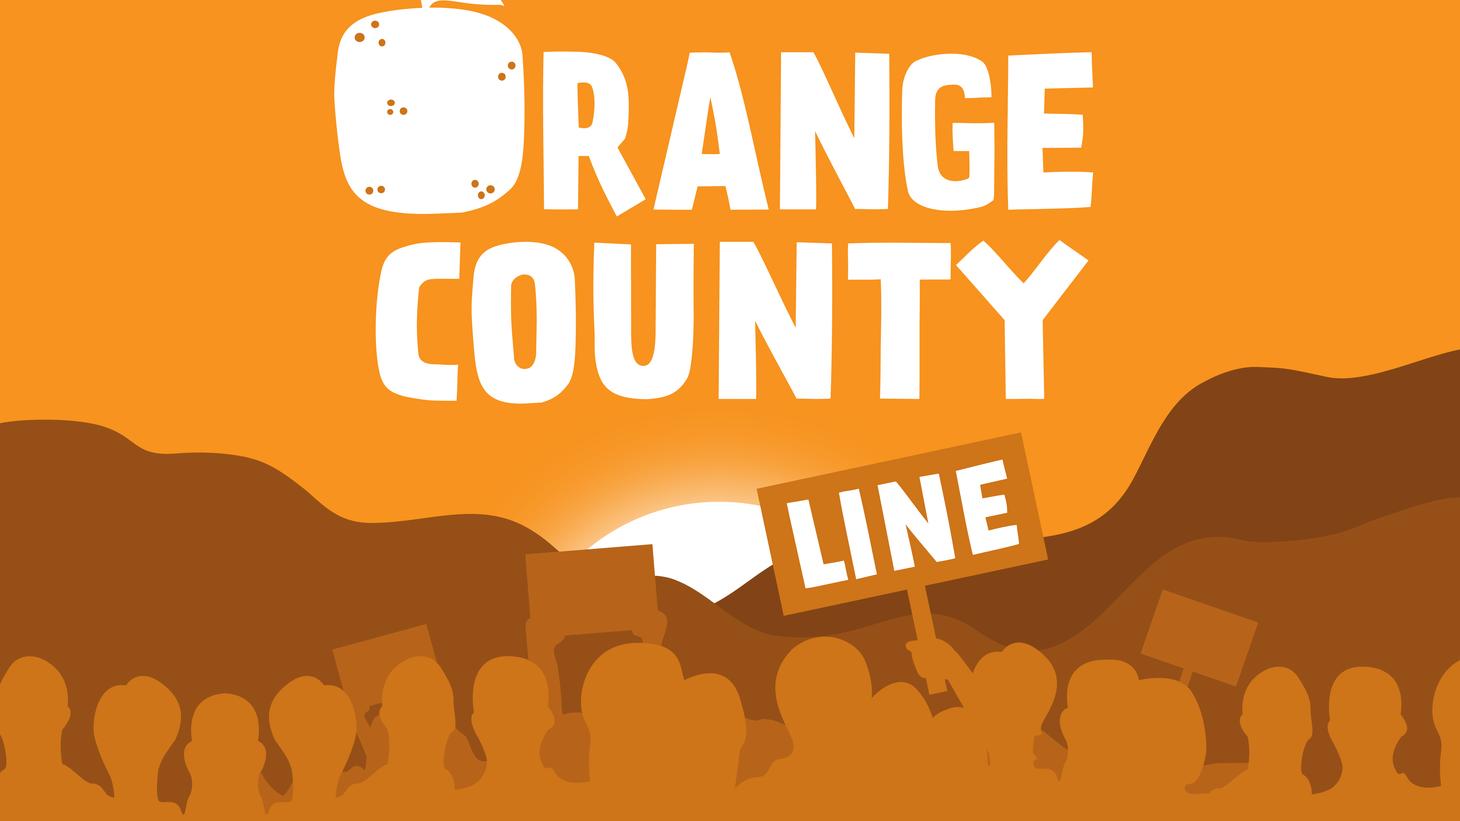 The Republican Party of Orange County's diversity effort.